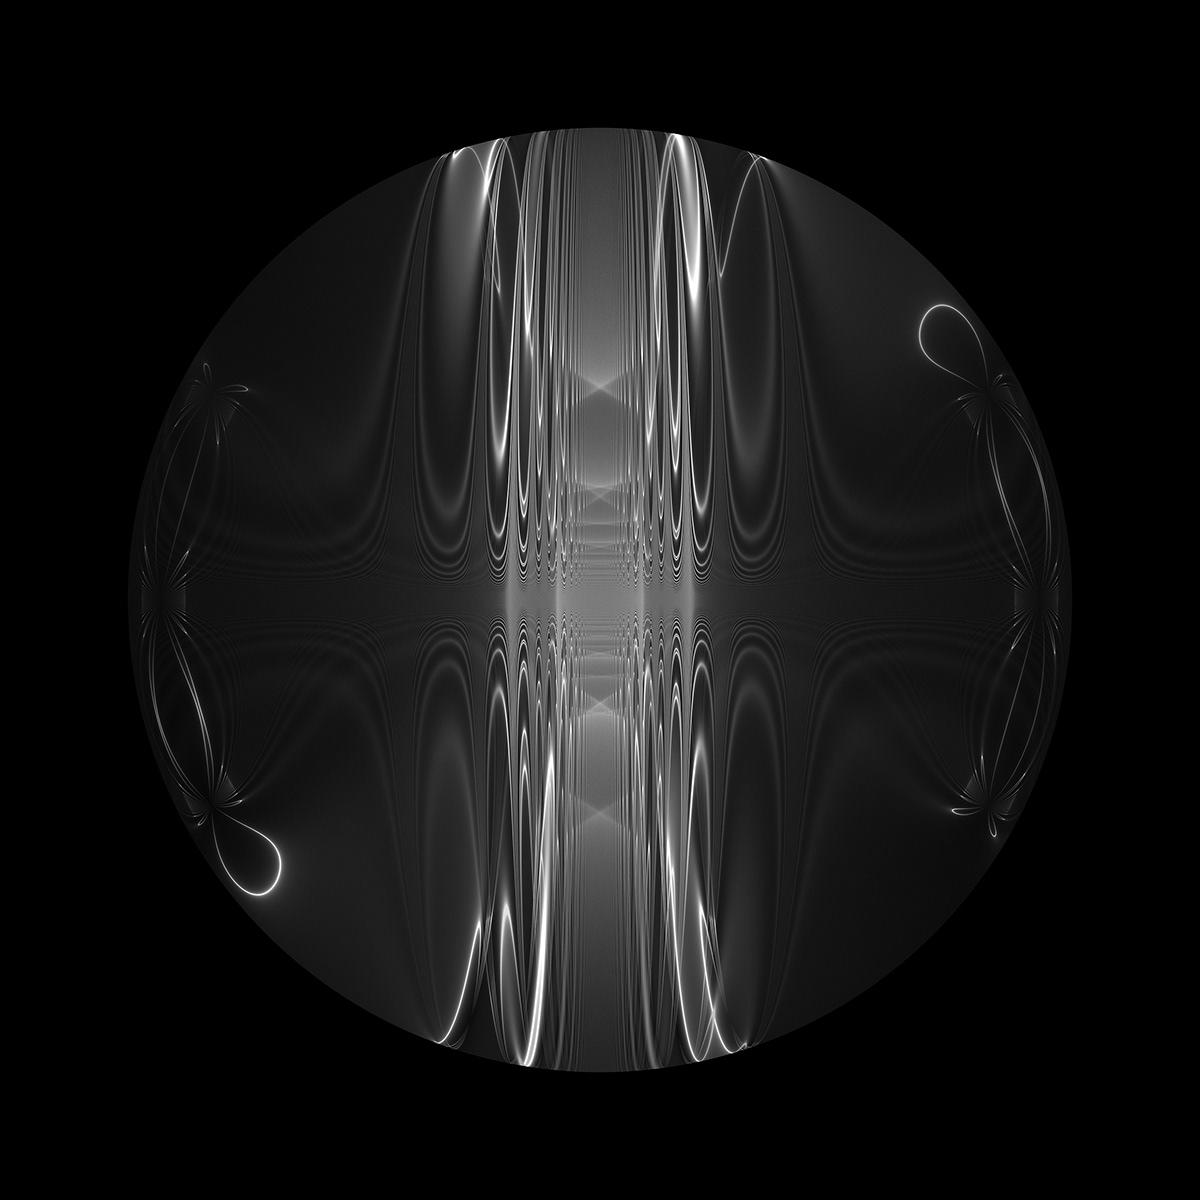 mathematical Procedural generative poster OSL octane Cinema abstract pattern digital